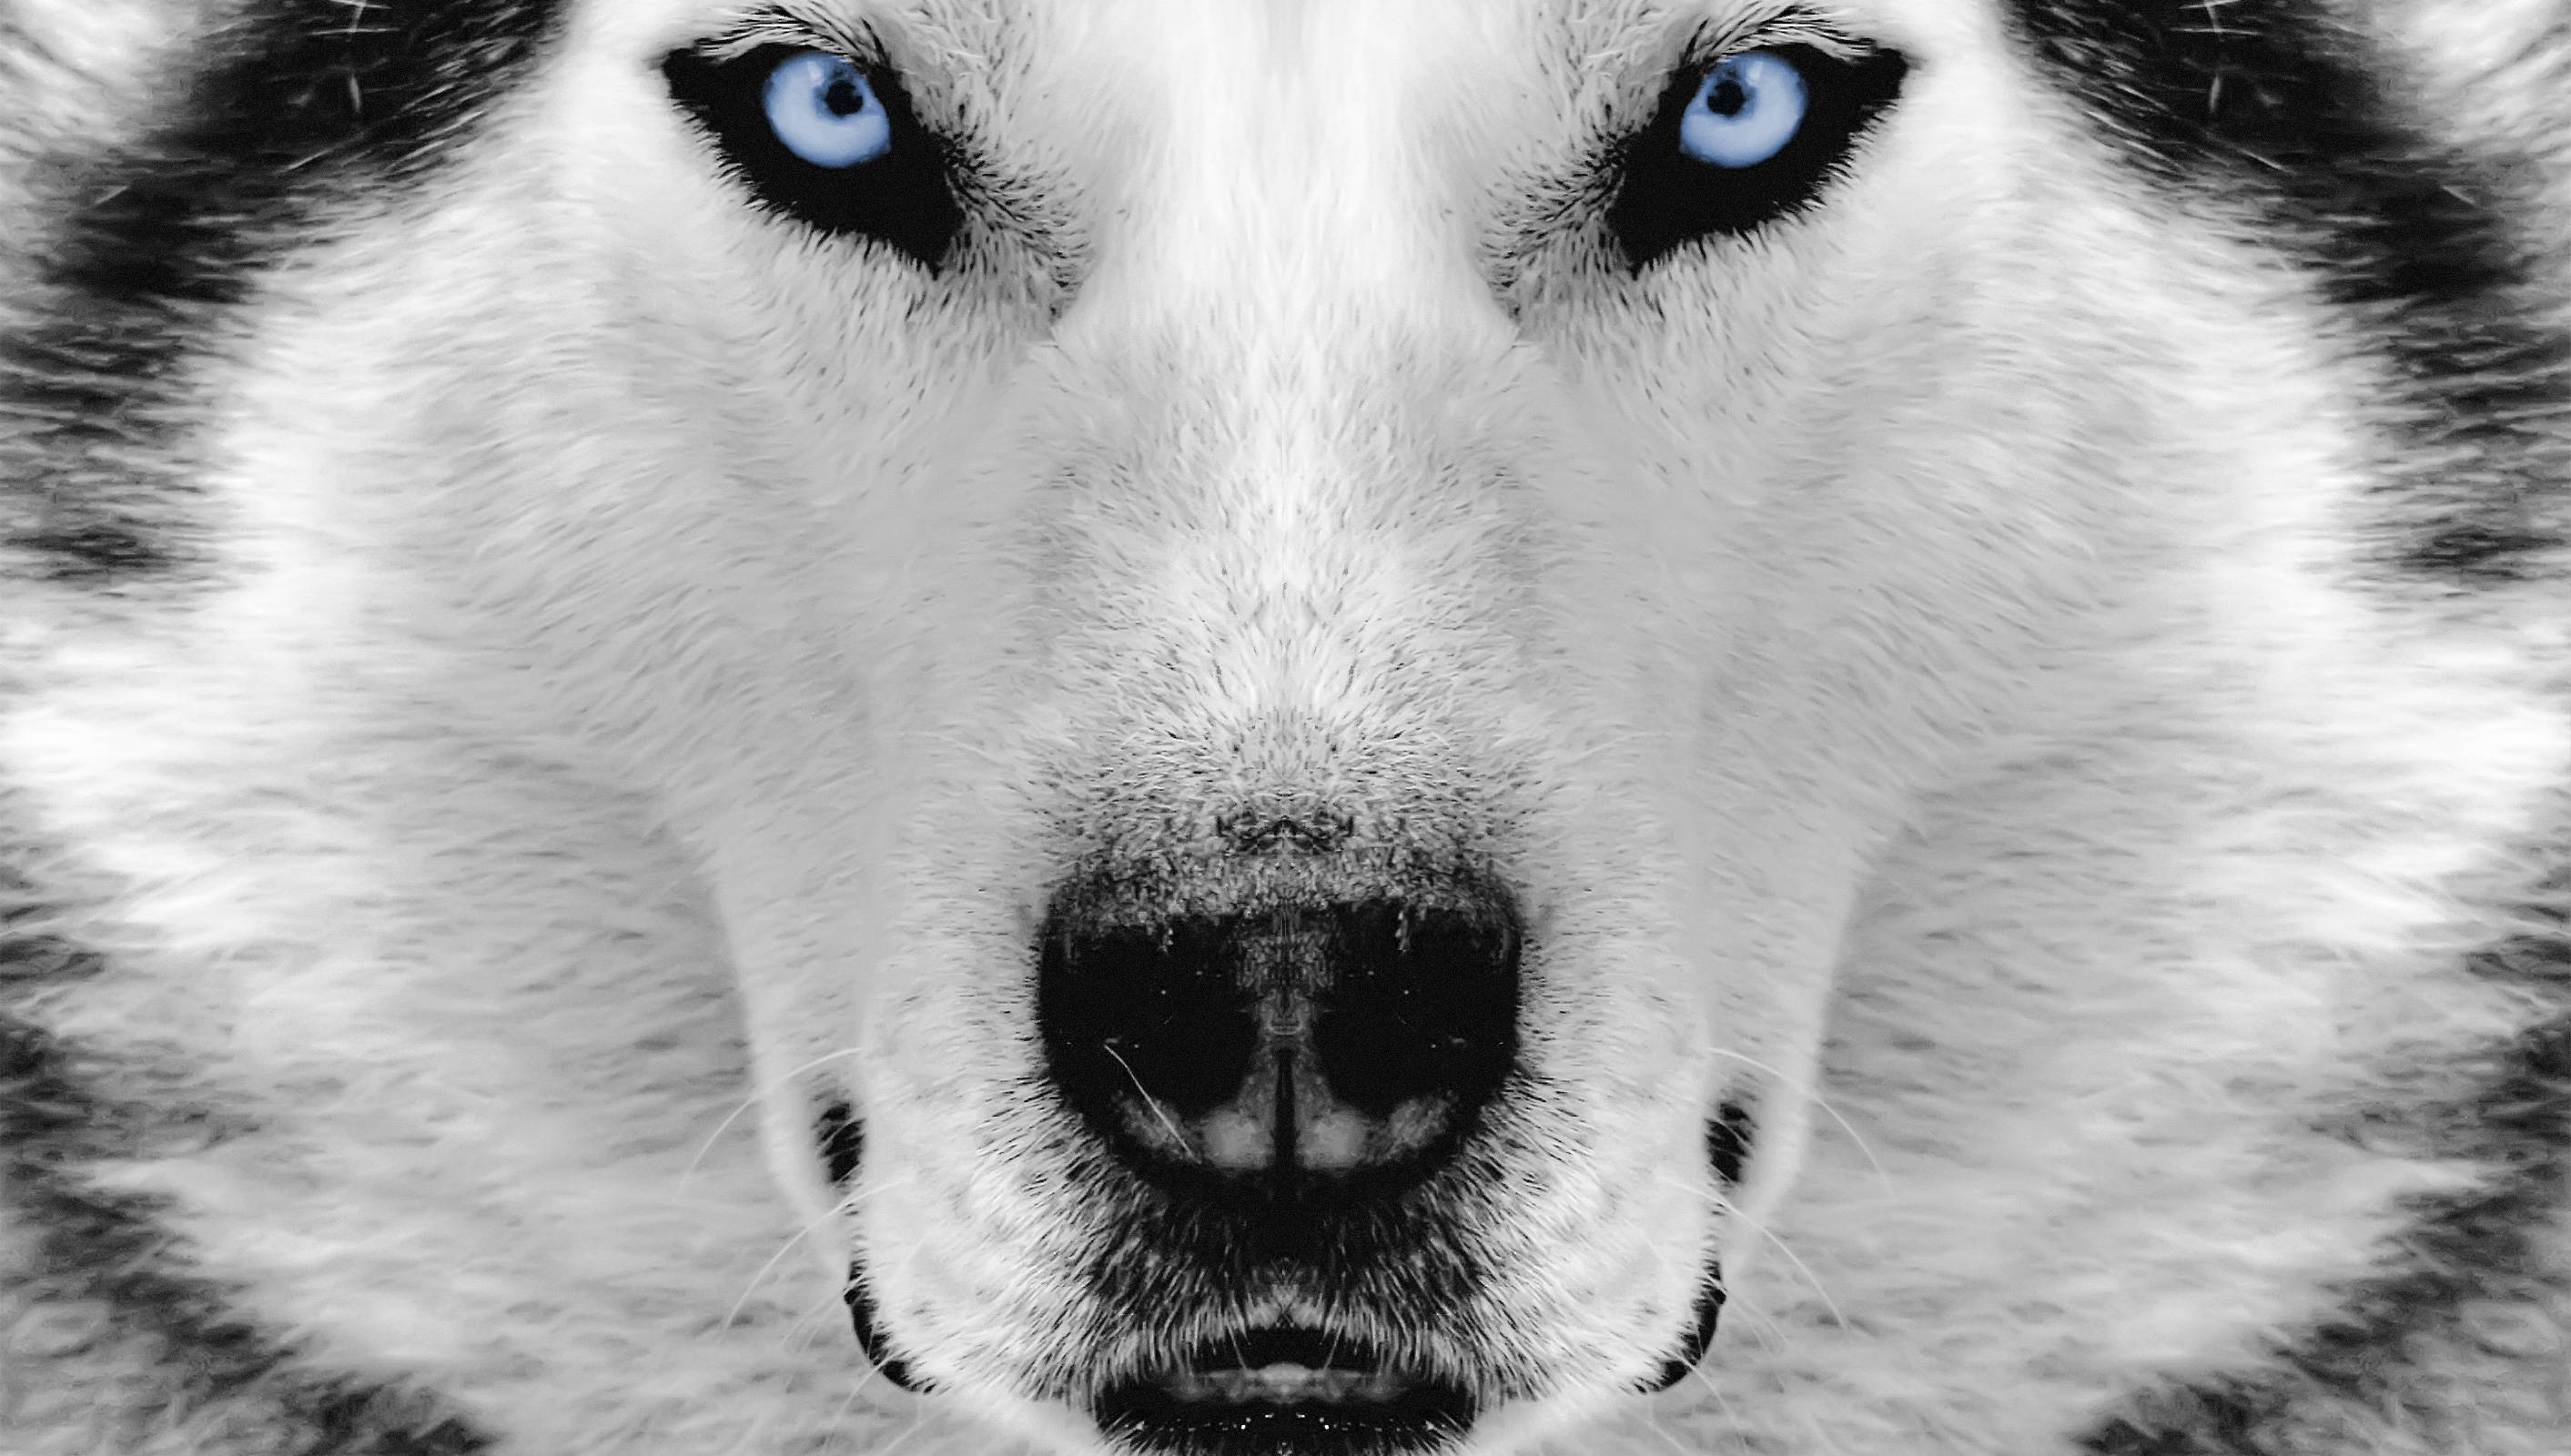 dress - Husky Siberian wallpaper pictures video